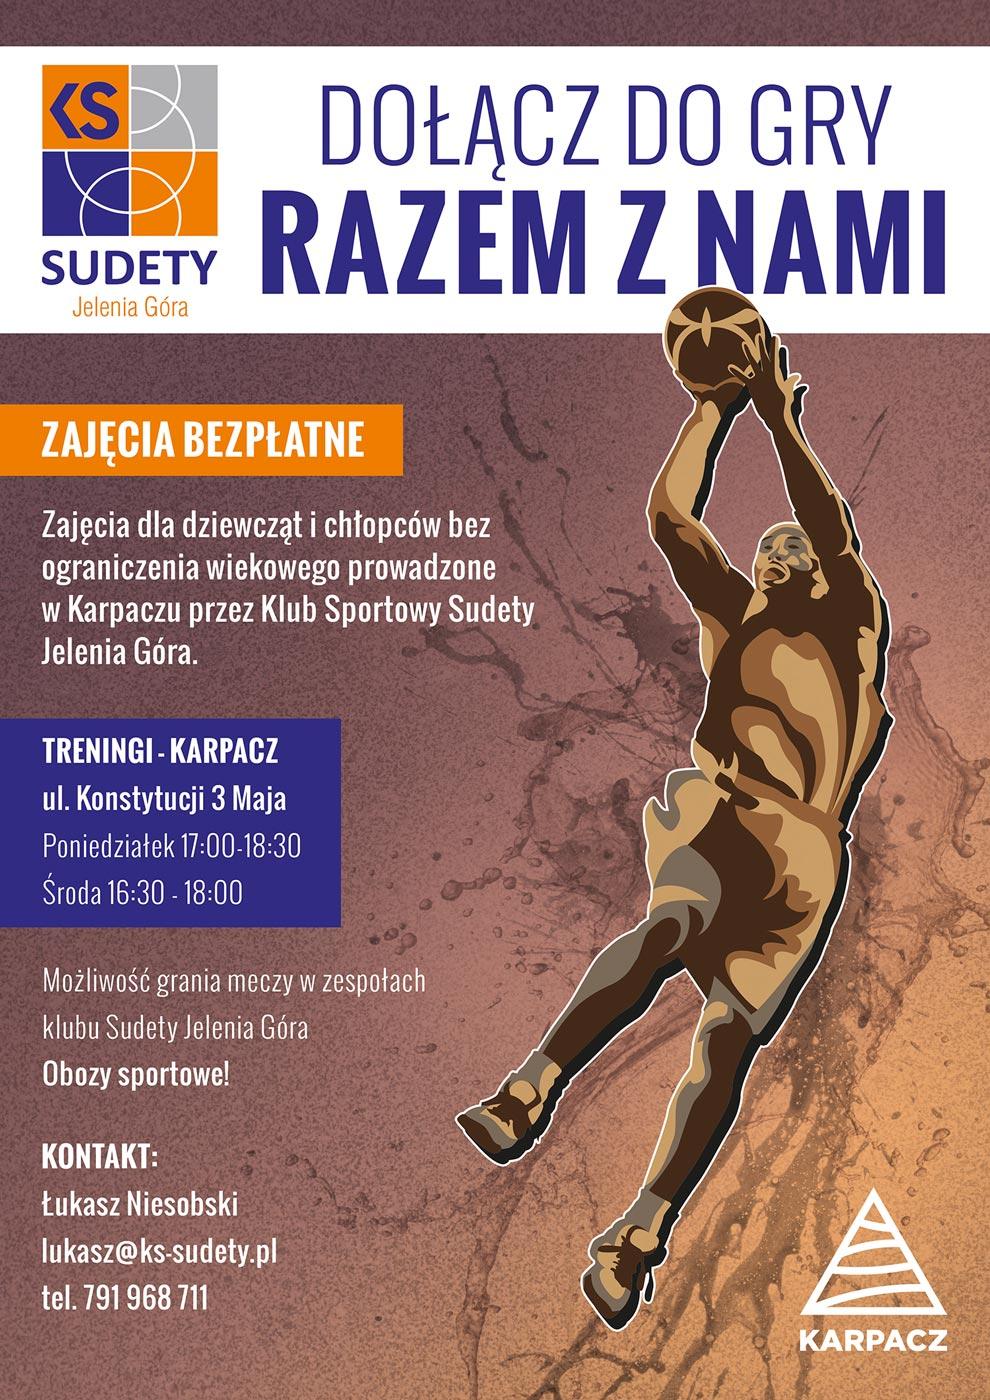 poster-ks-sudety-jelenia-gora-sekcja-karpacz